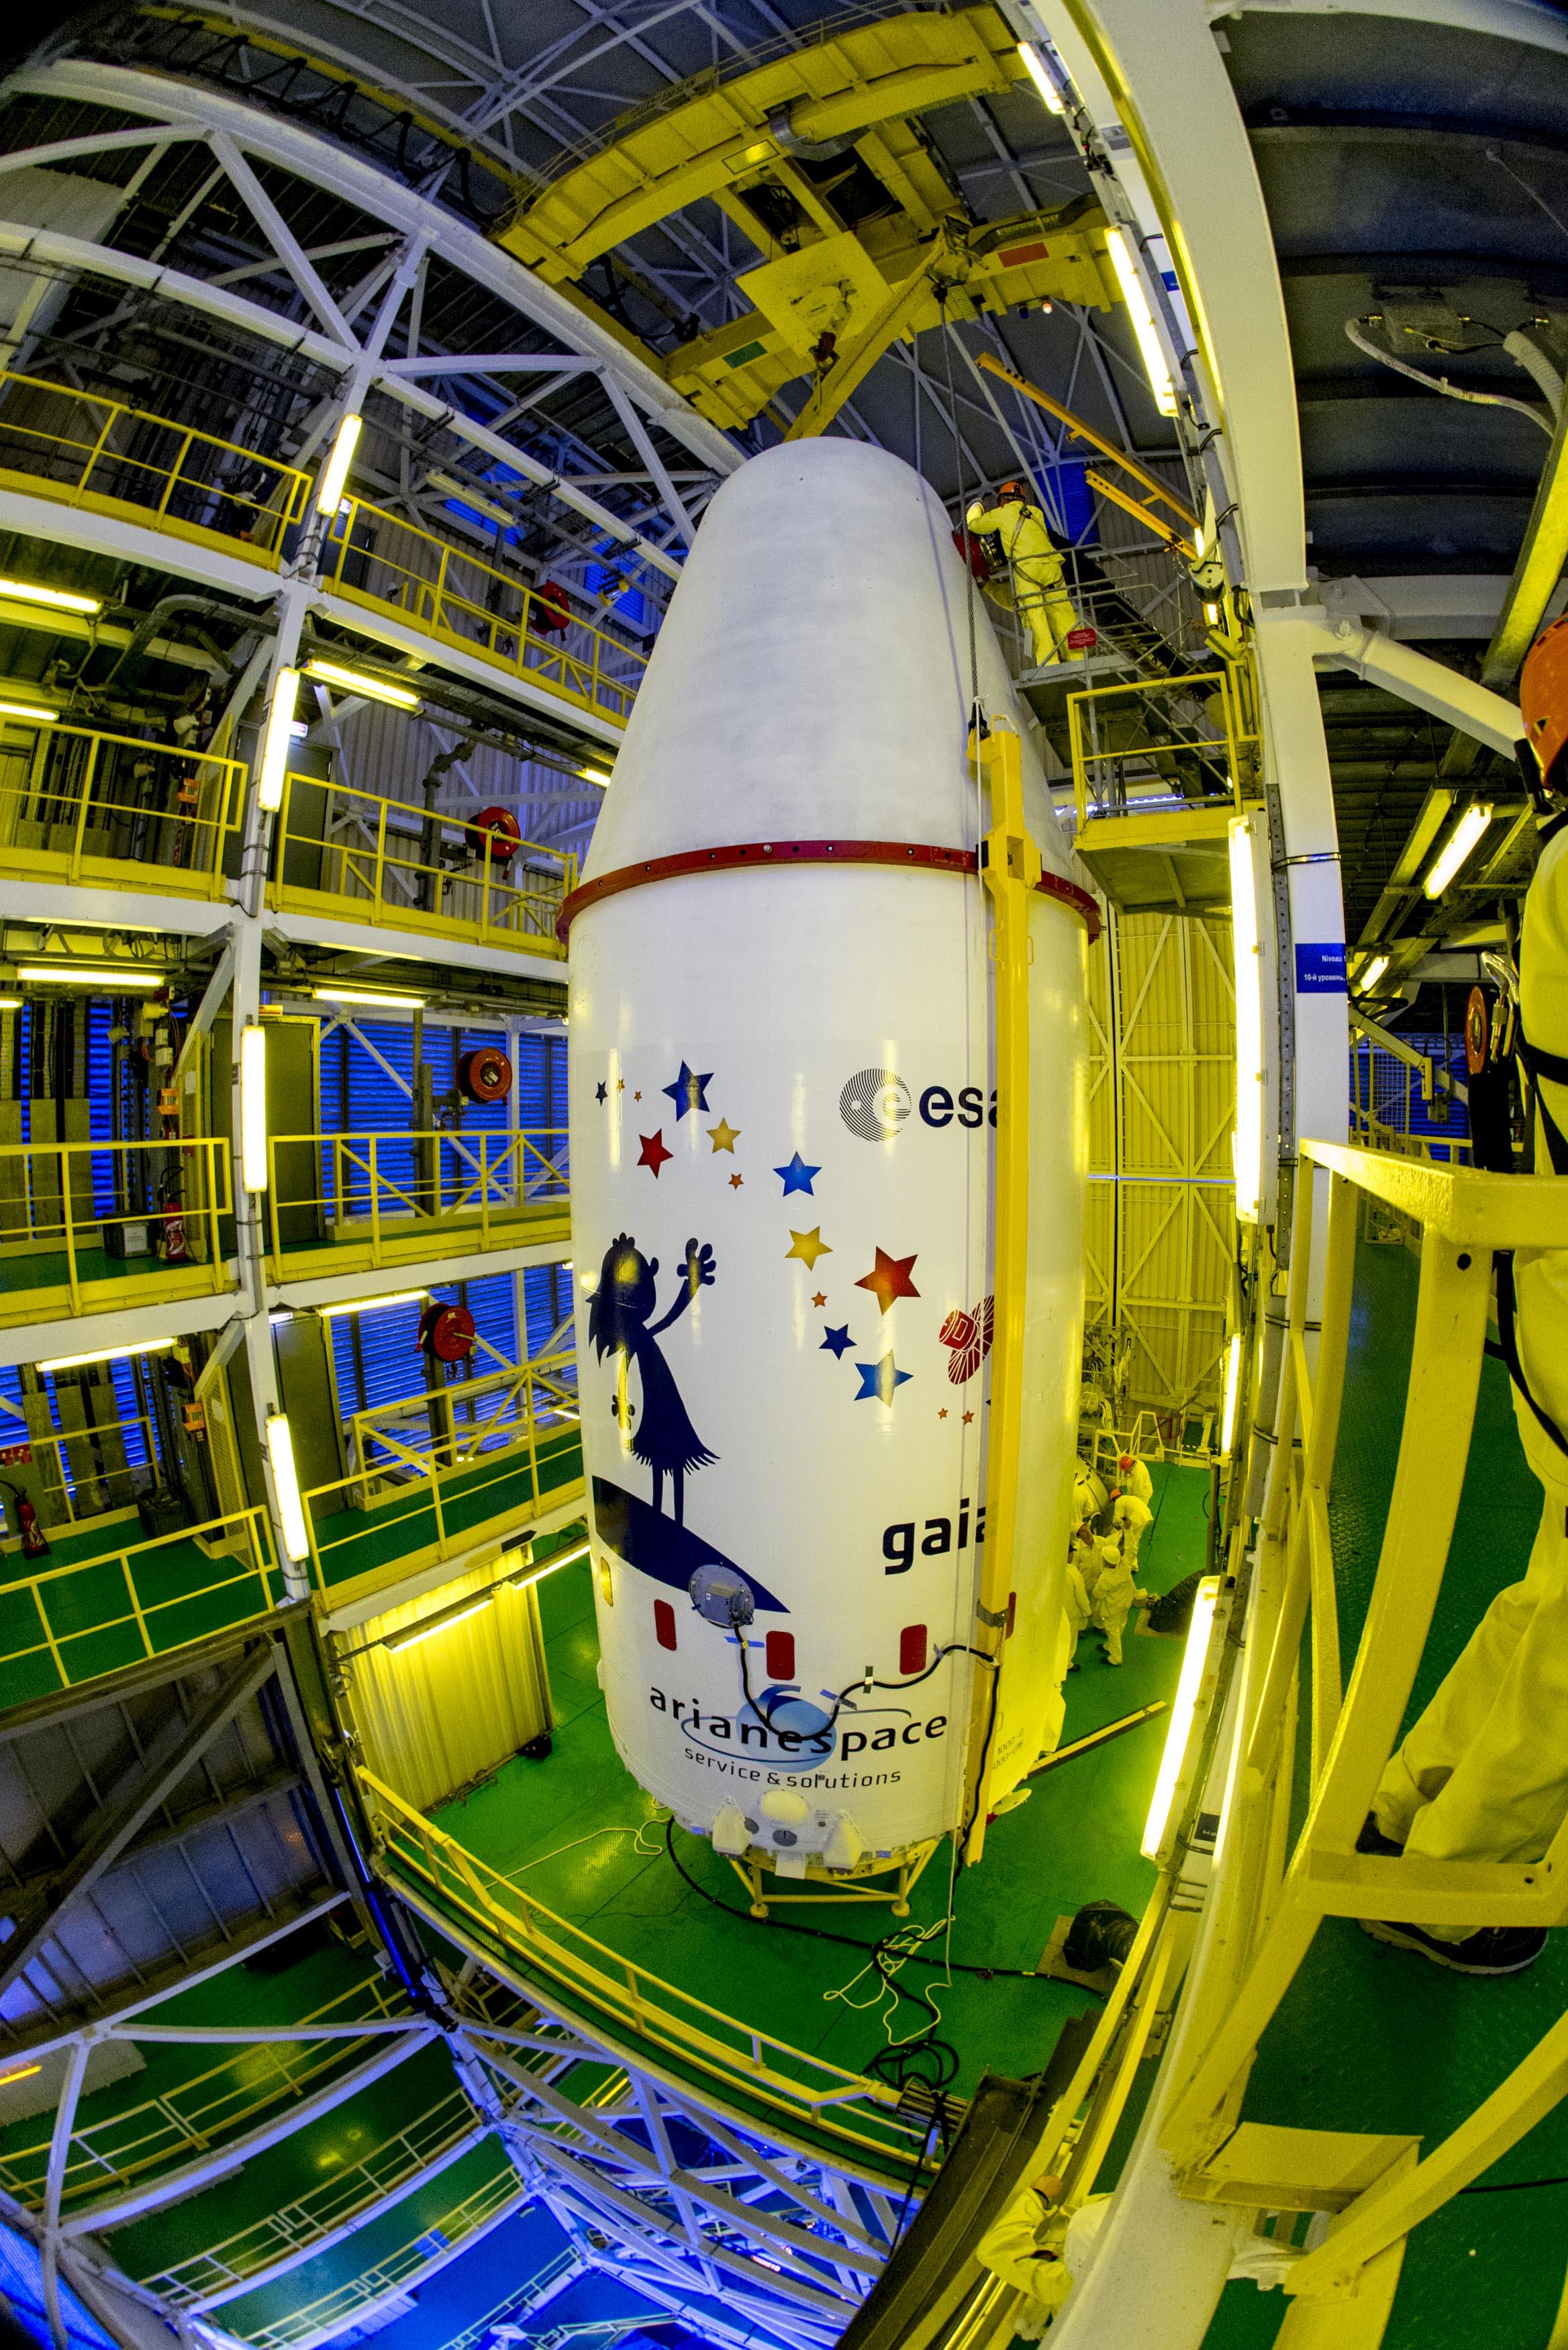 gaia spacecraft milky way map - photo #20